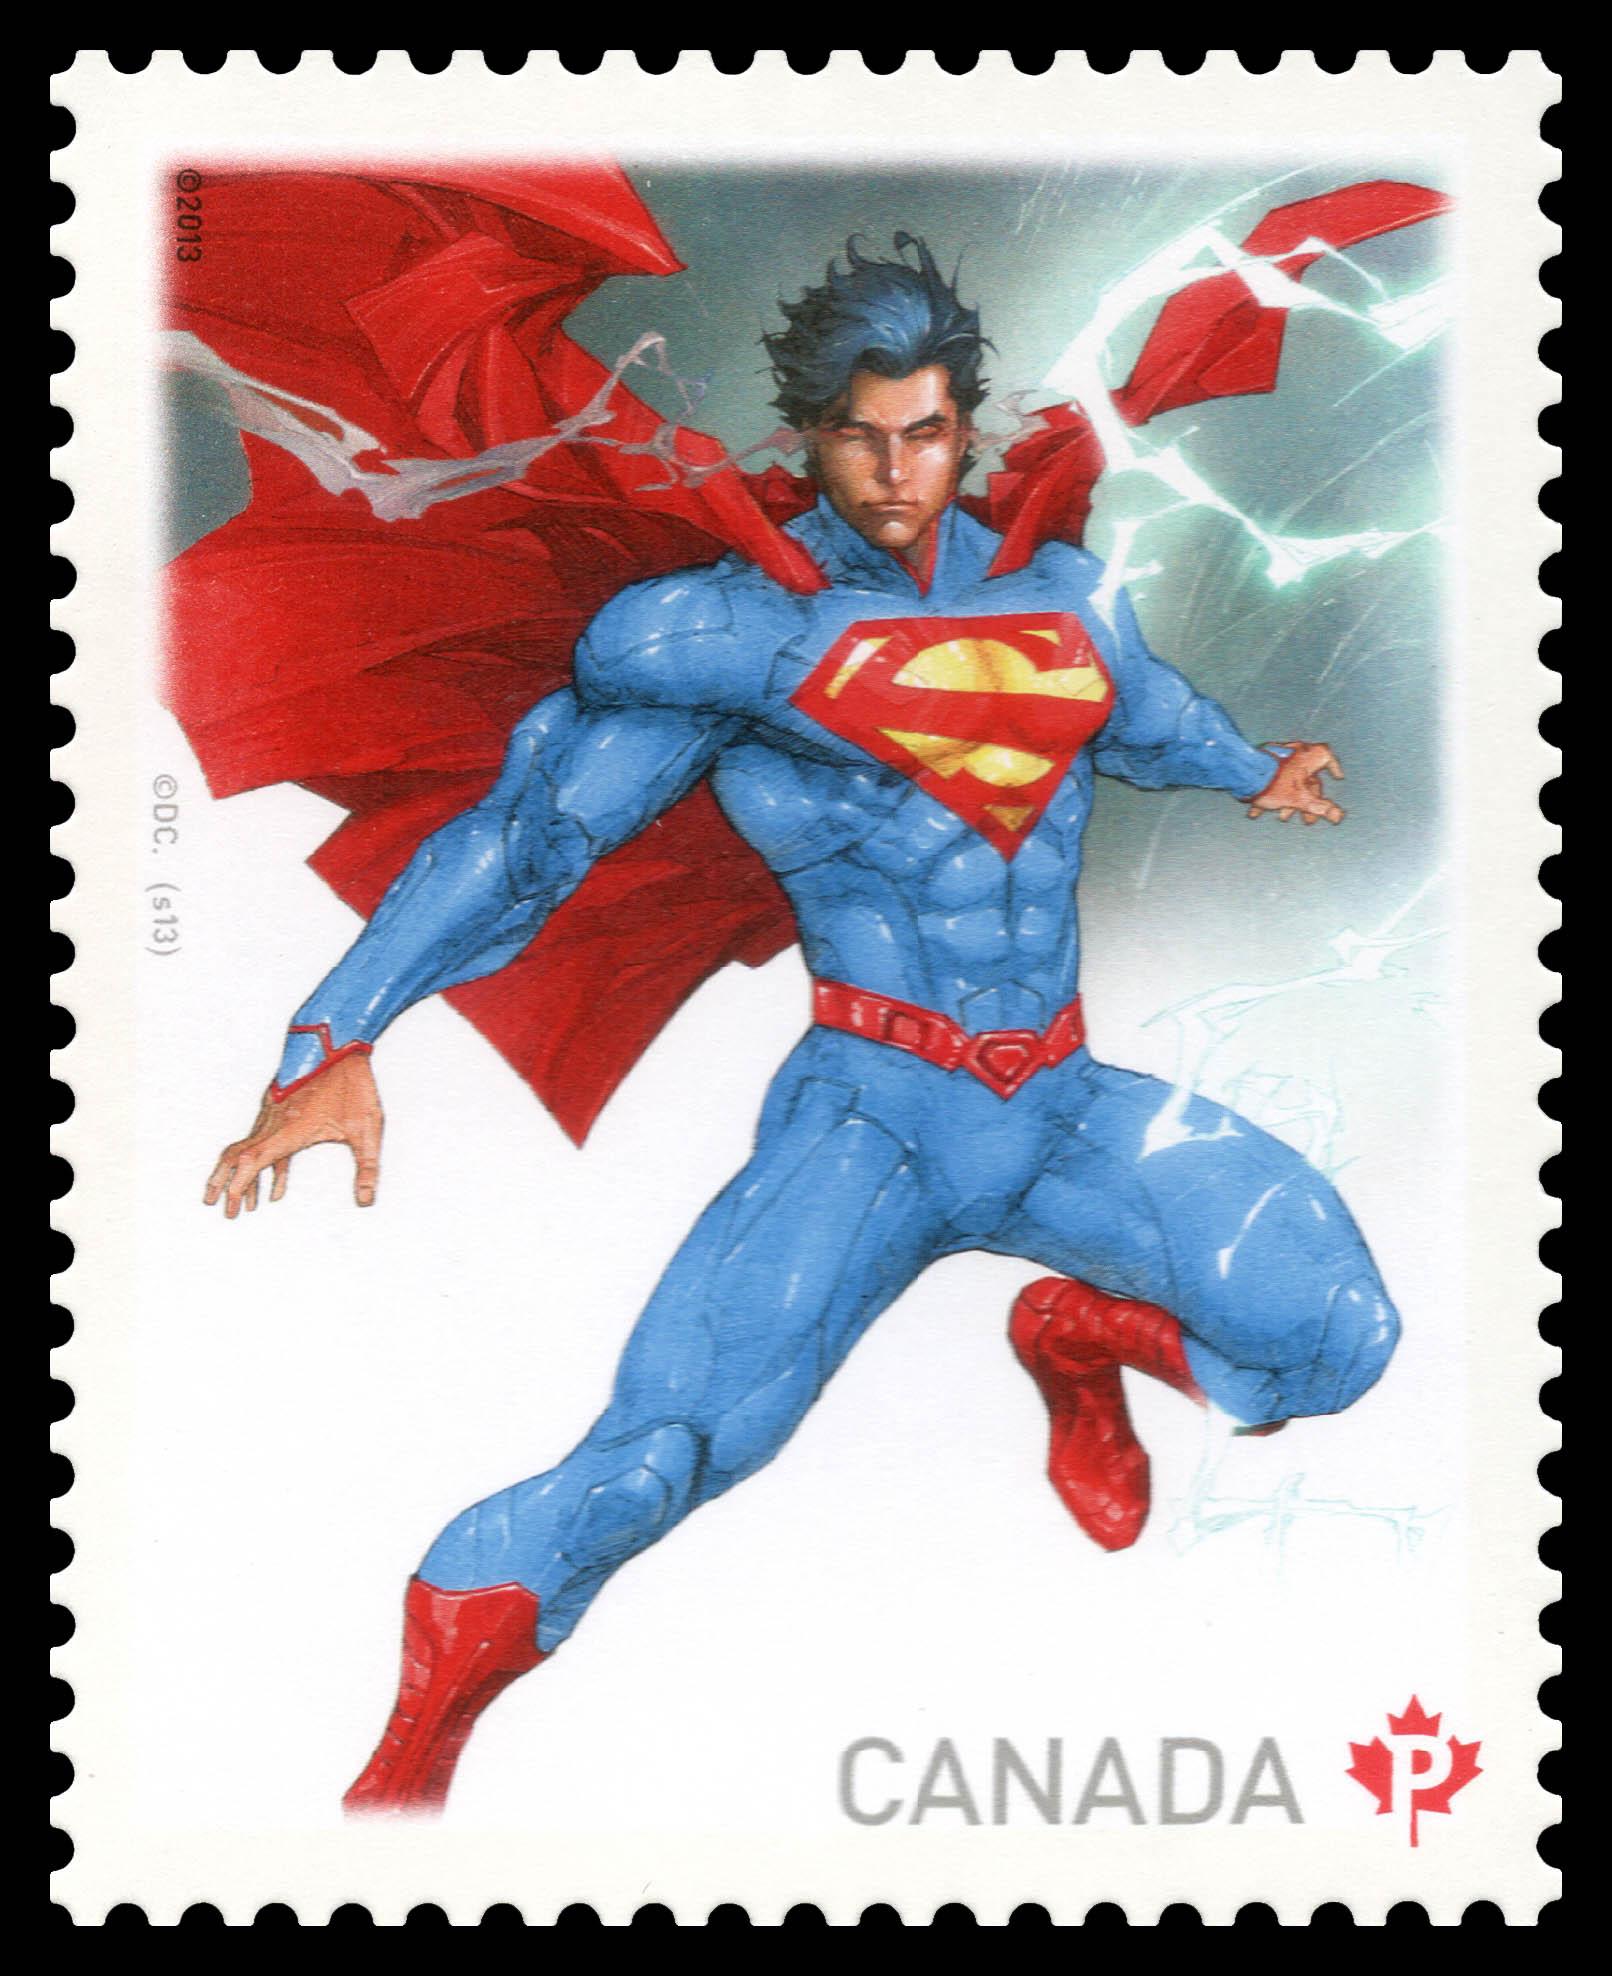 Superman Canada Postage Stamp | Superman - 75thAnniversary